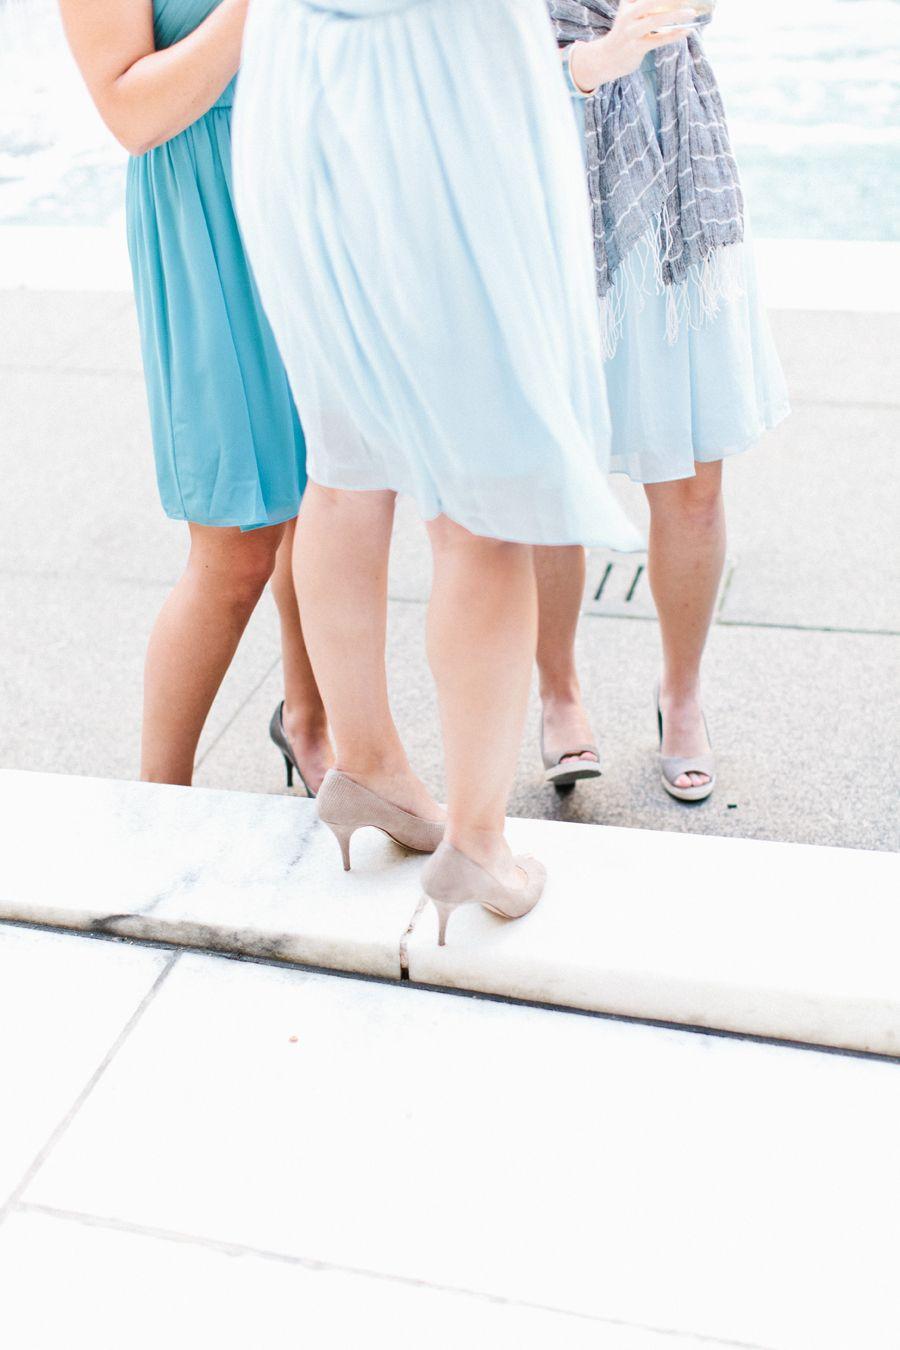 Pin de Cris en Moda - fashion  eb621a02a8dc